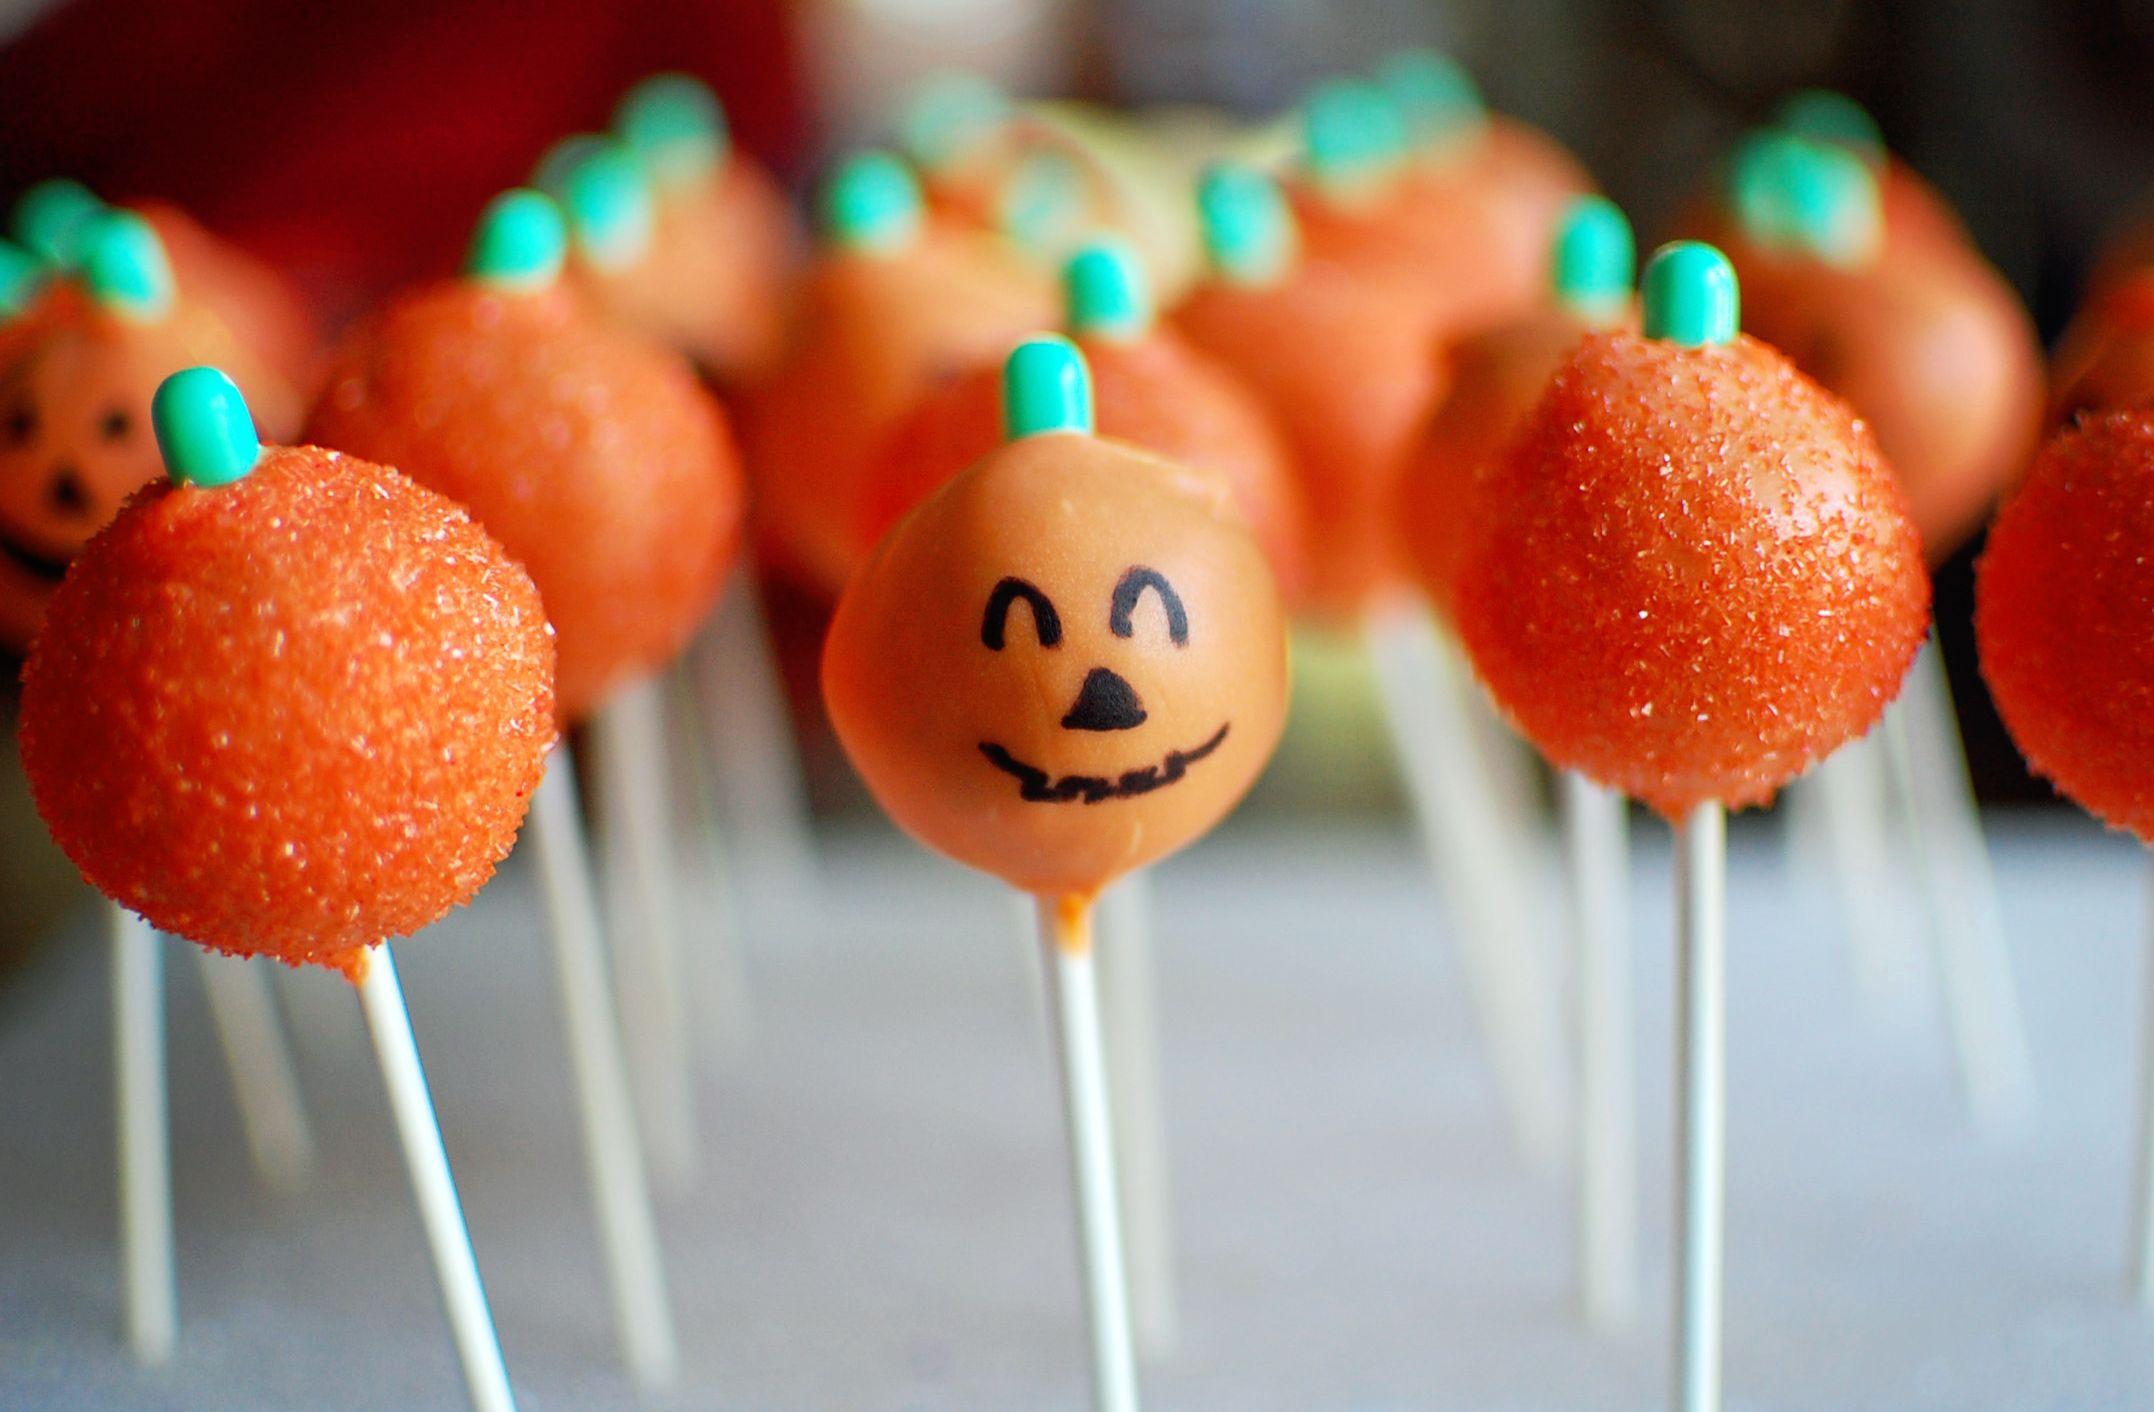 Google Image Result for http://upload.wikimedia.org/wikipedia/commons/2/25/Jack-o%27-lantern_pumpkin_cake_pops,_October_2011.jpg